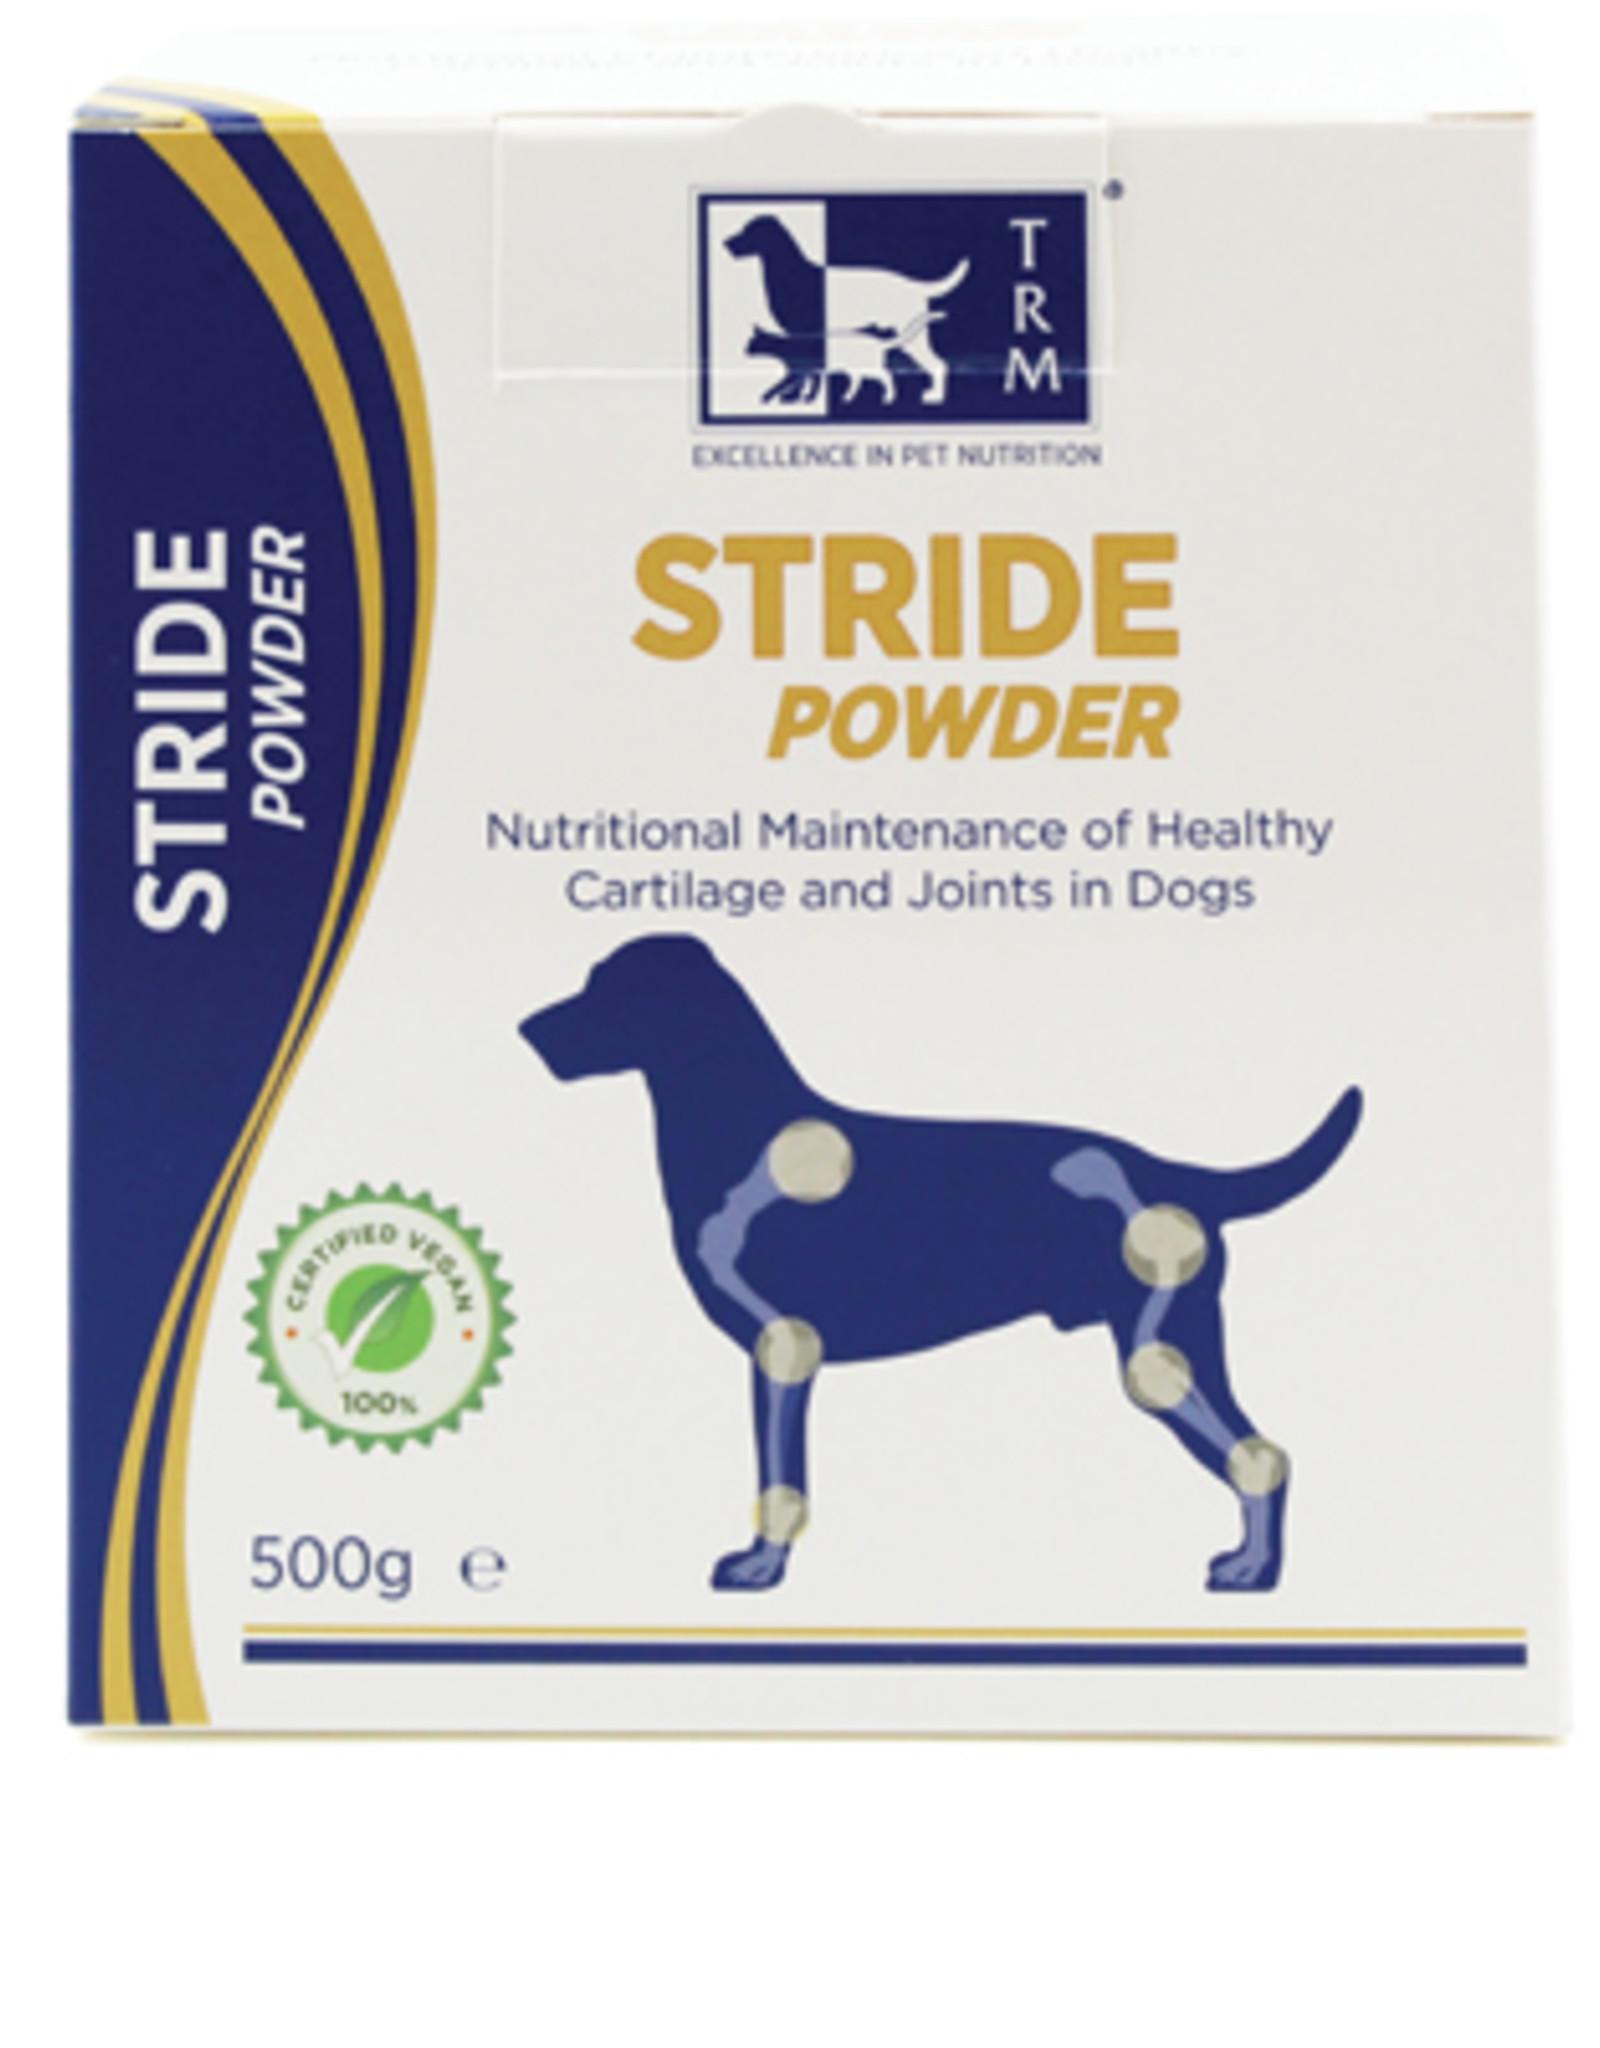 TRM Trm Stride Dog 500g